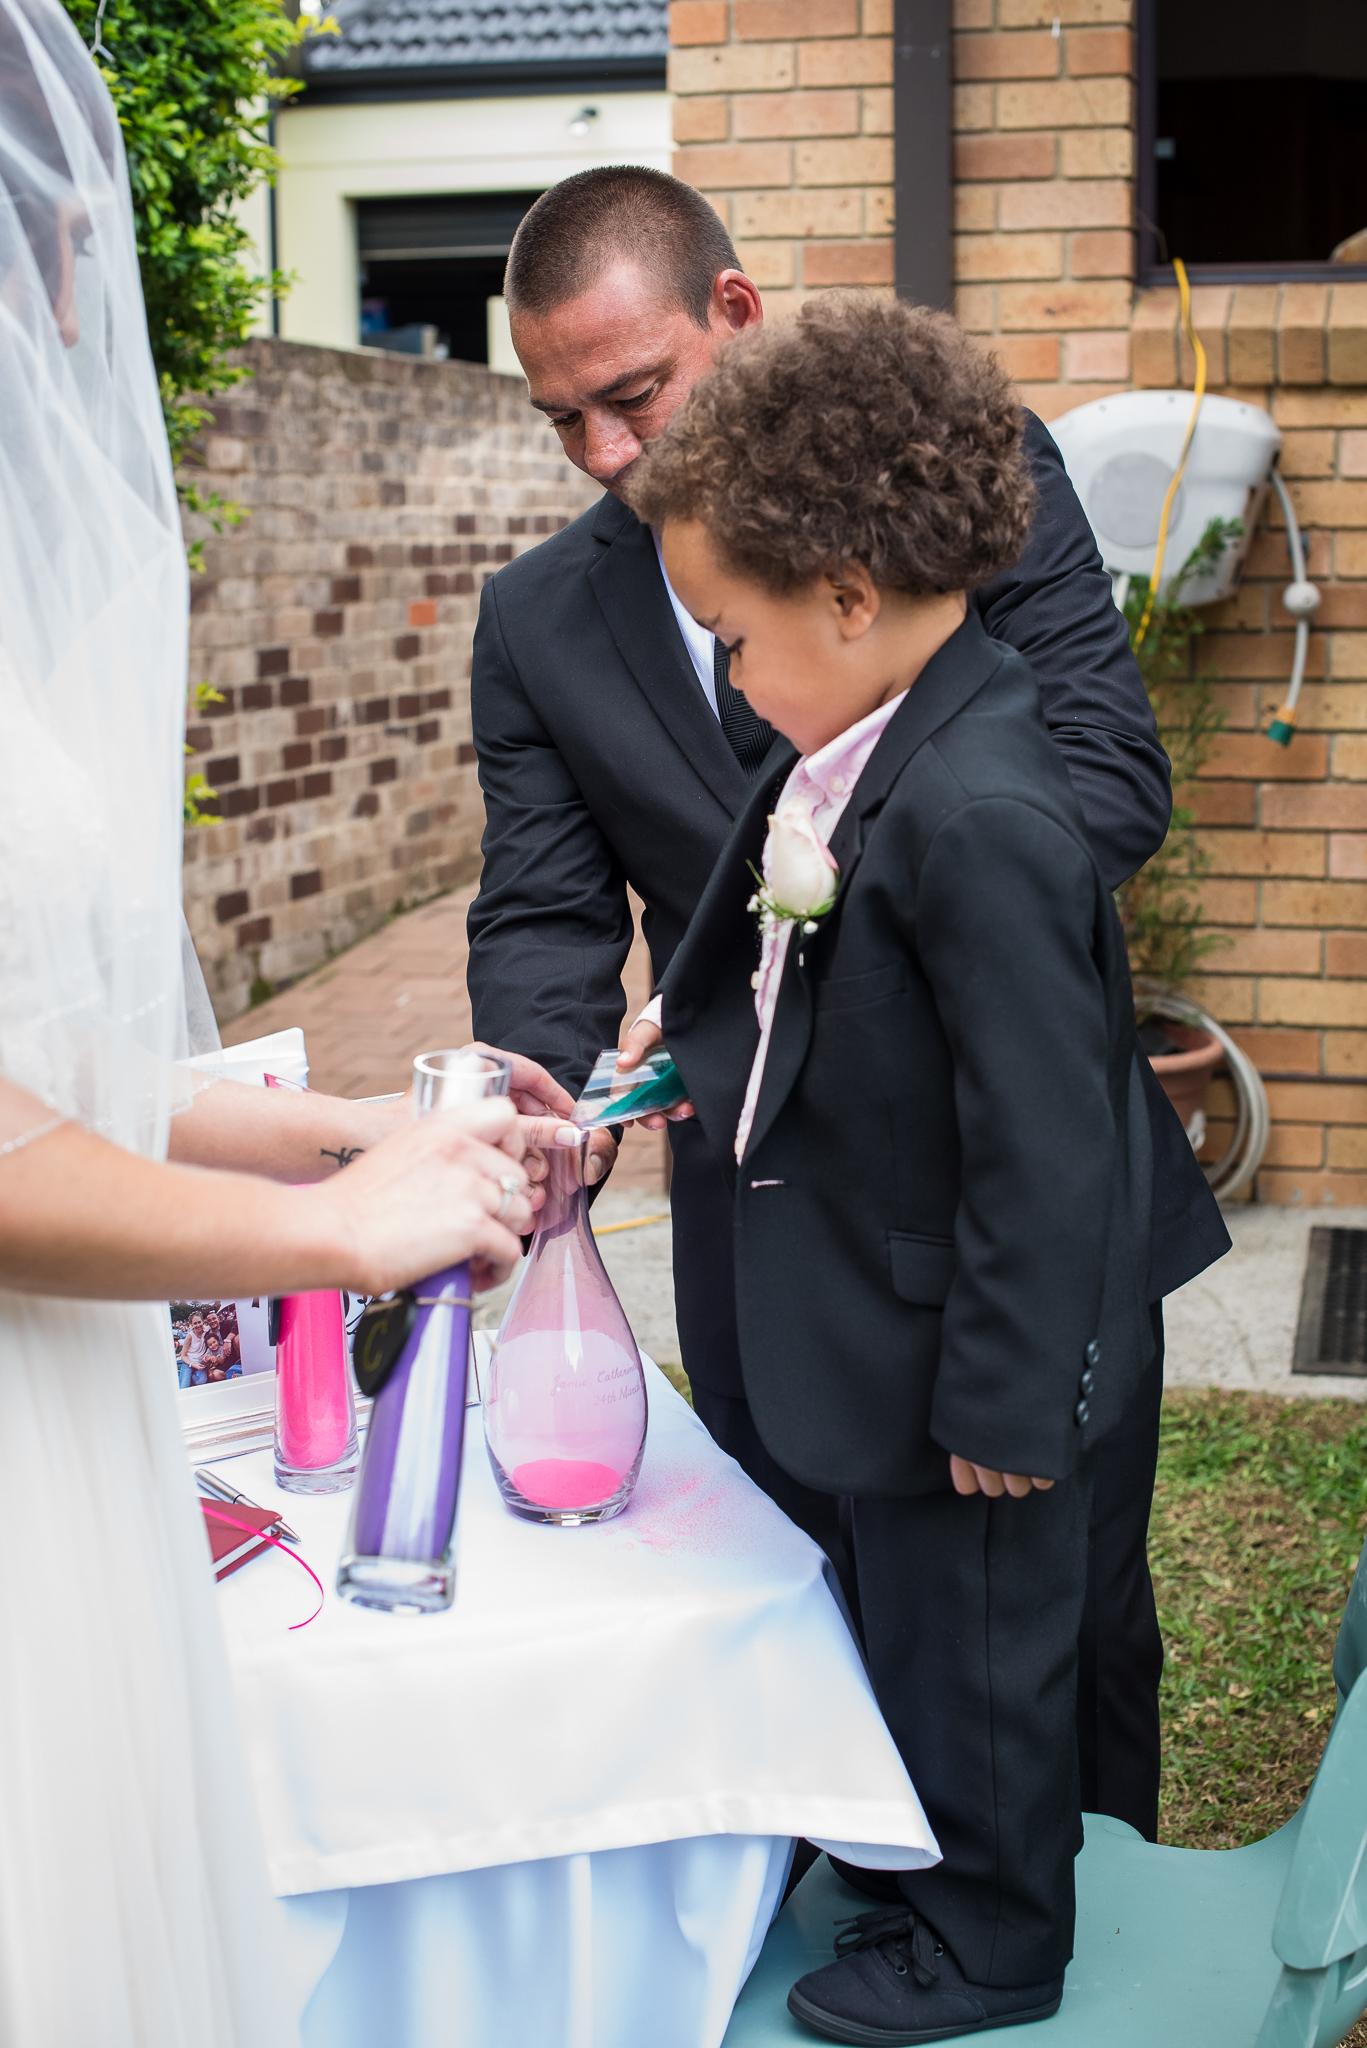 unique wedding ceremonies in sydney